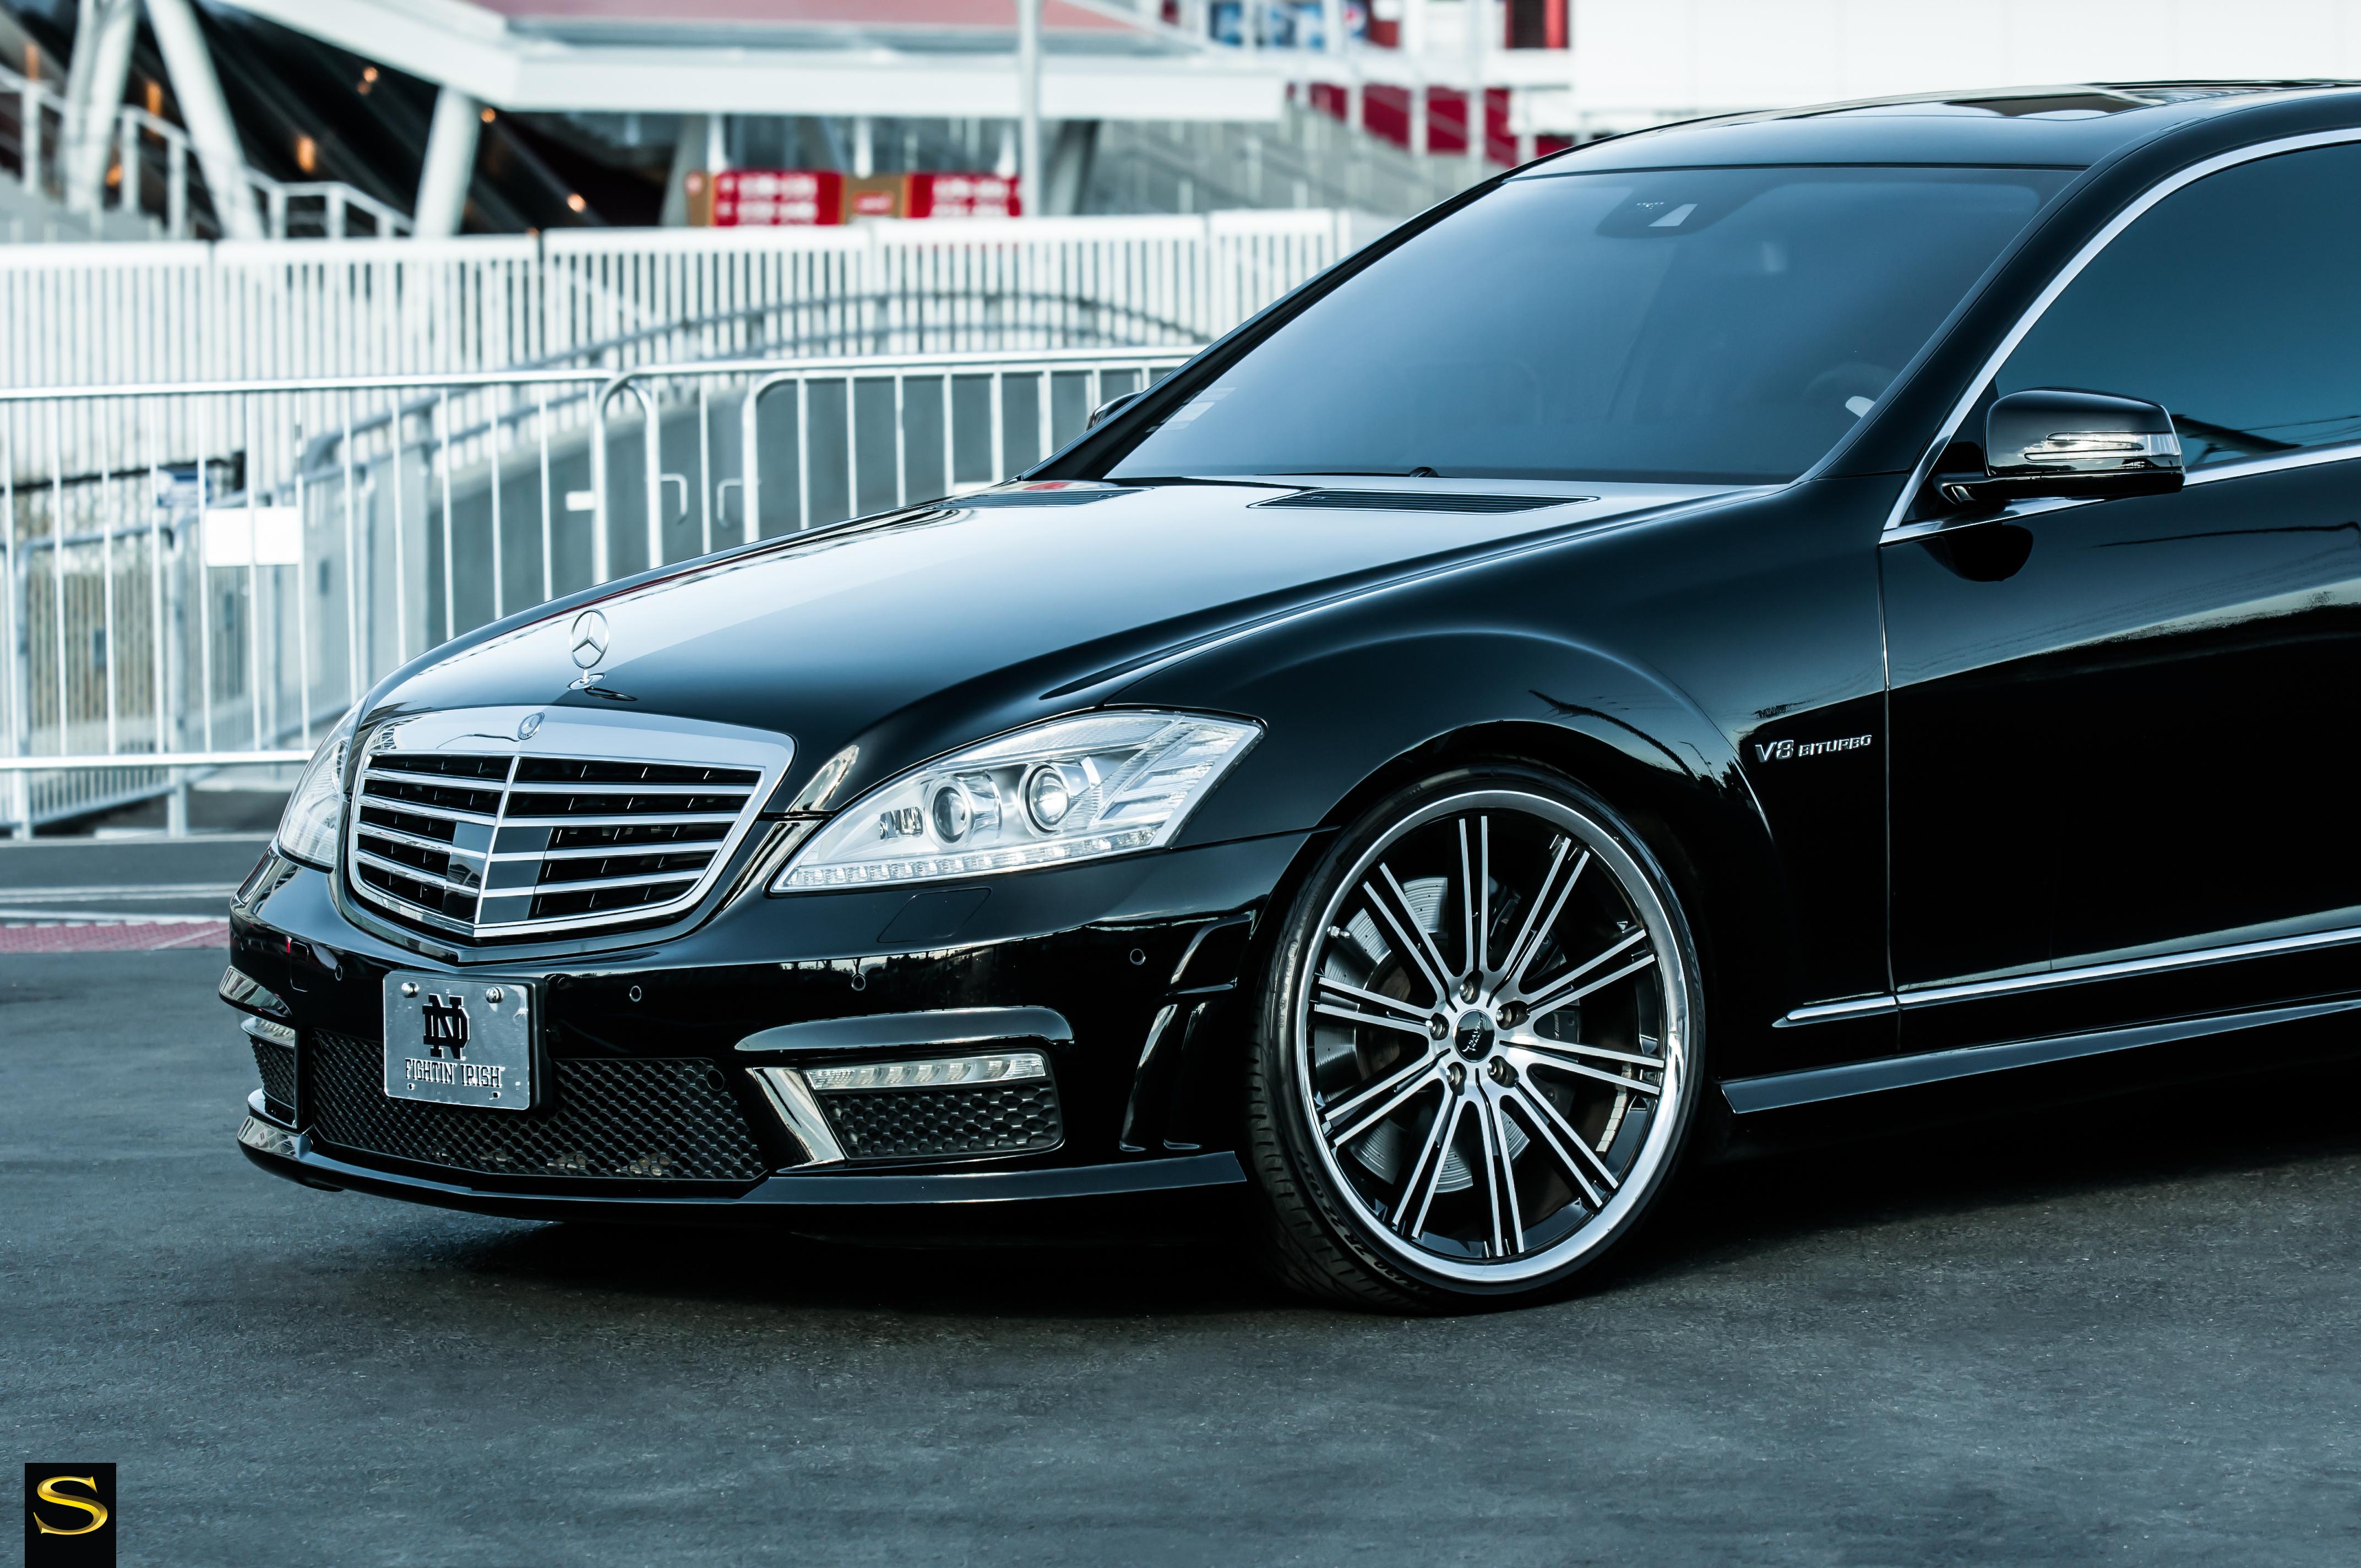 Black-California-Wheels-Mercedes-Benz-S63-Saini-Wheels-Black di-Forza-BM3-Machined-Black-Stainless-Steel-4